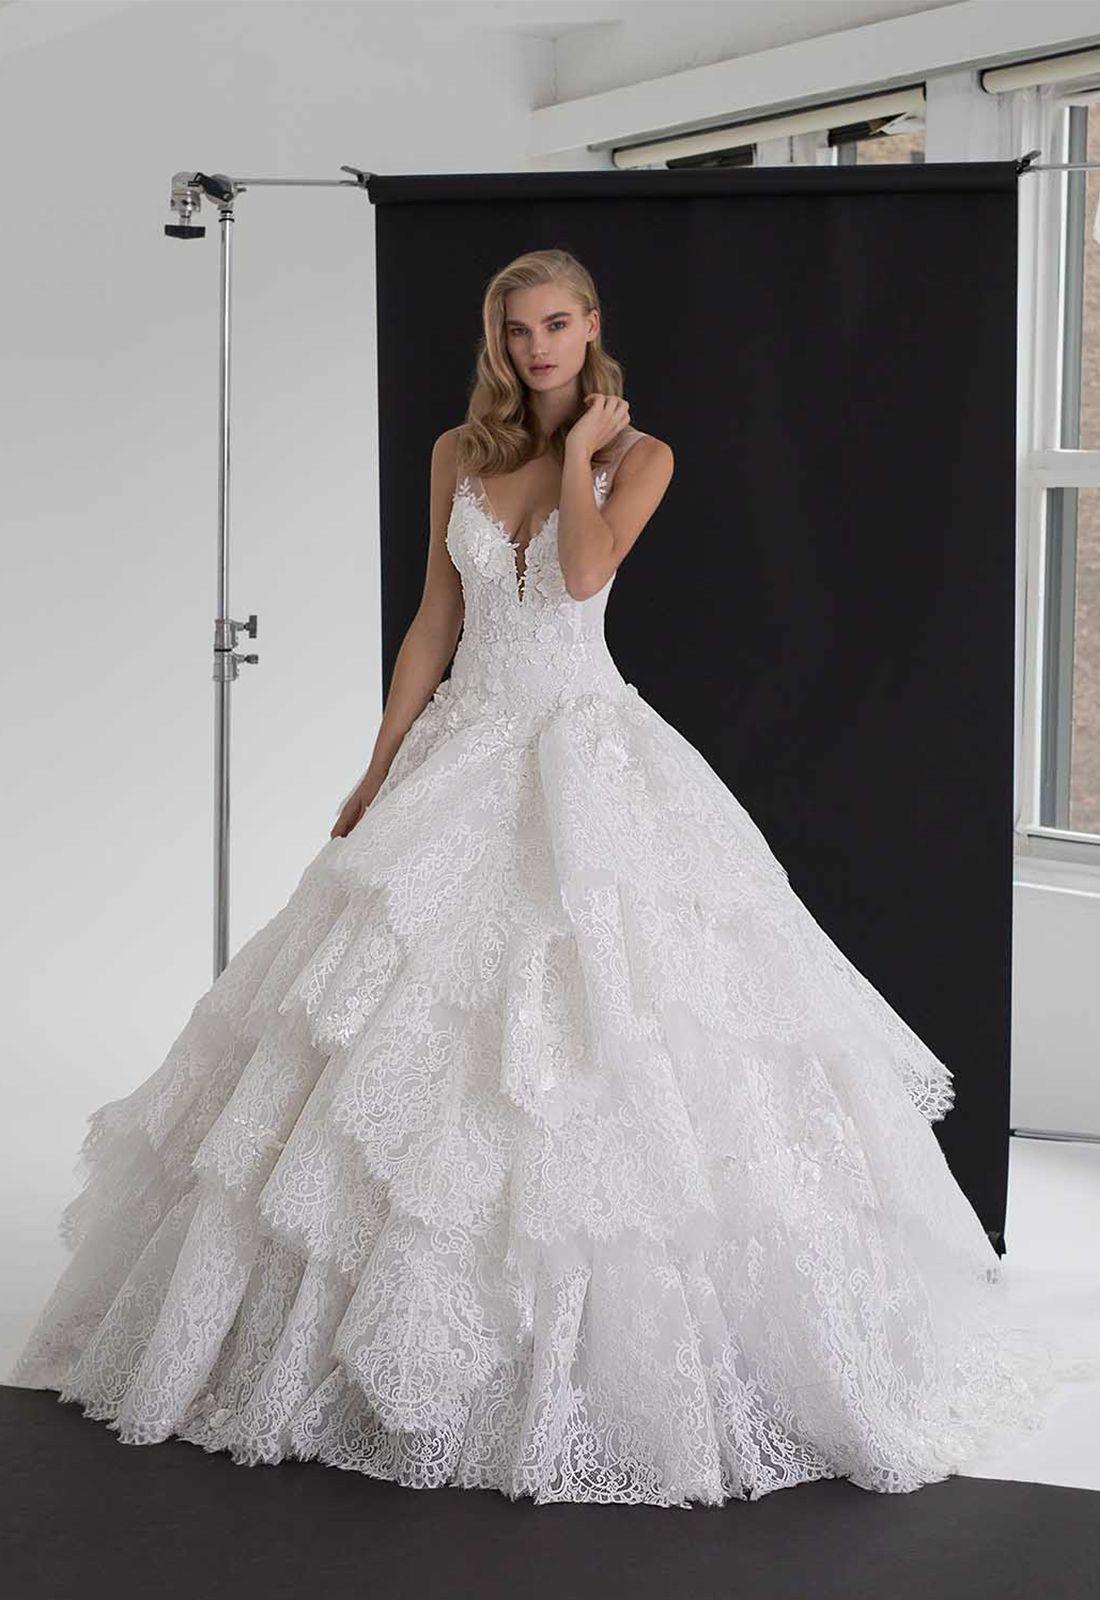 Style No 4719 Pnina Tornai Wedding Dress Pinina Tornai Wedding Dresses Wedding Dresses